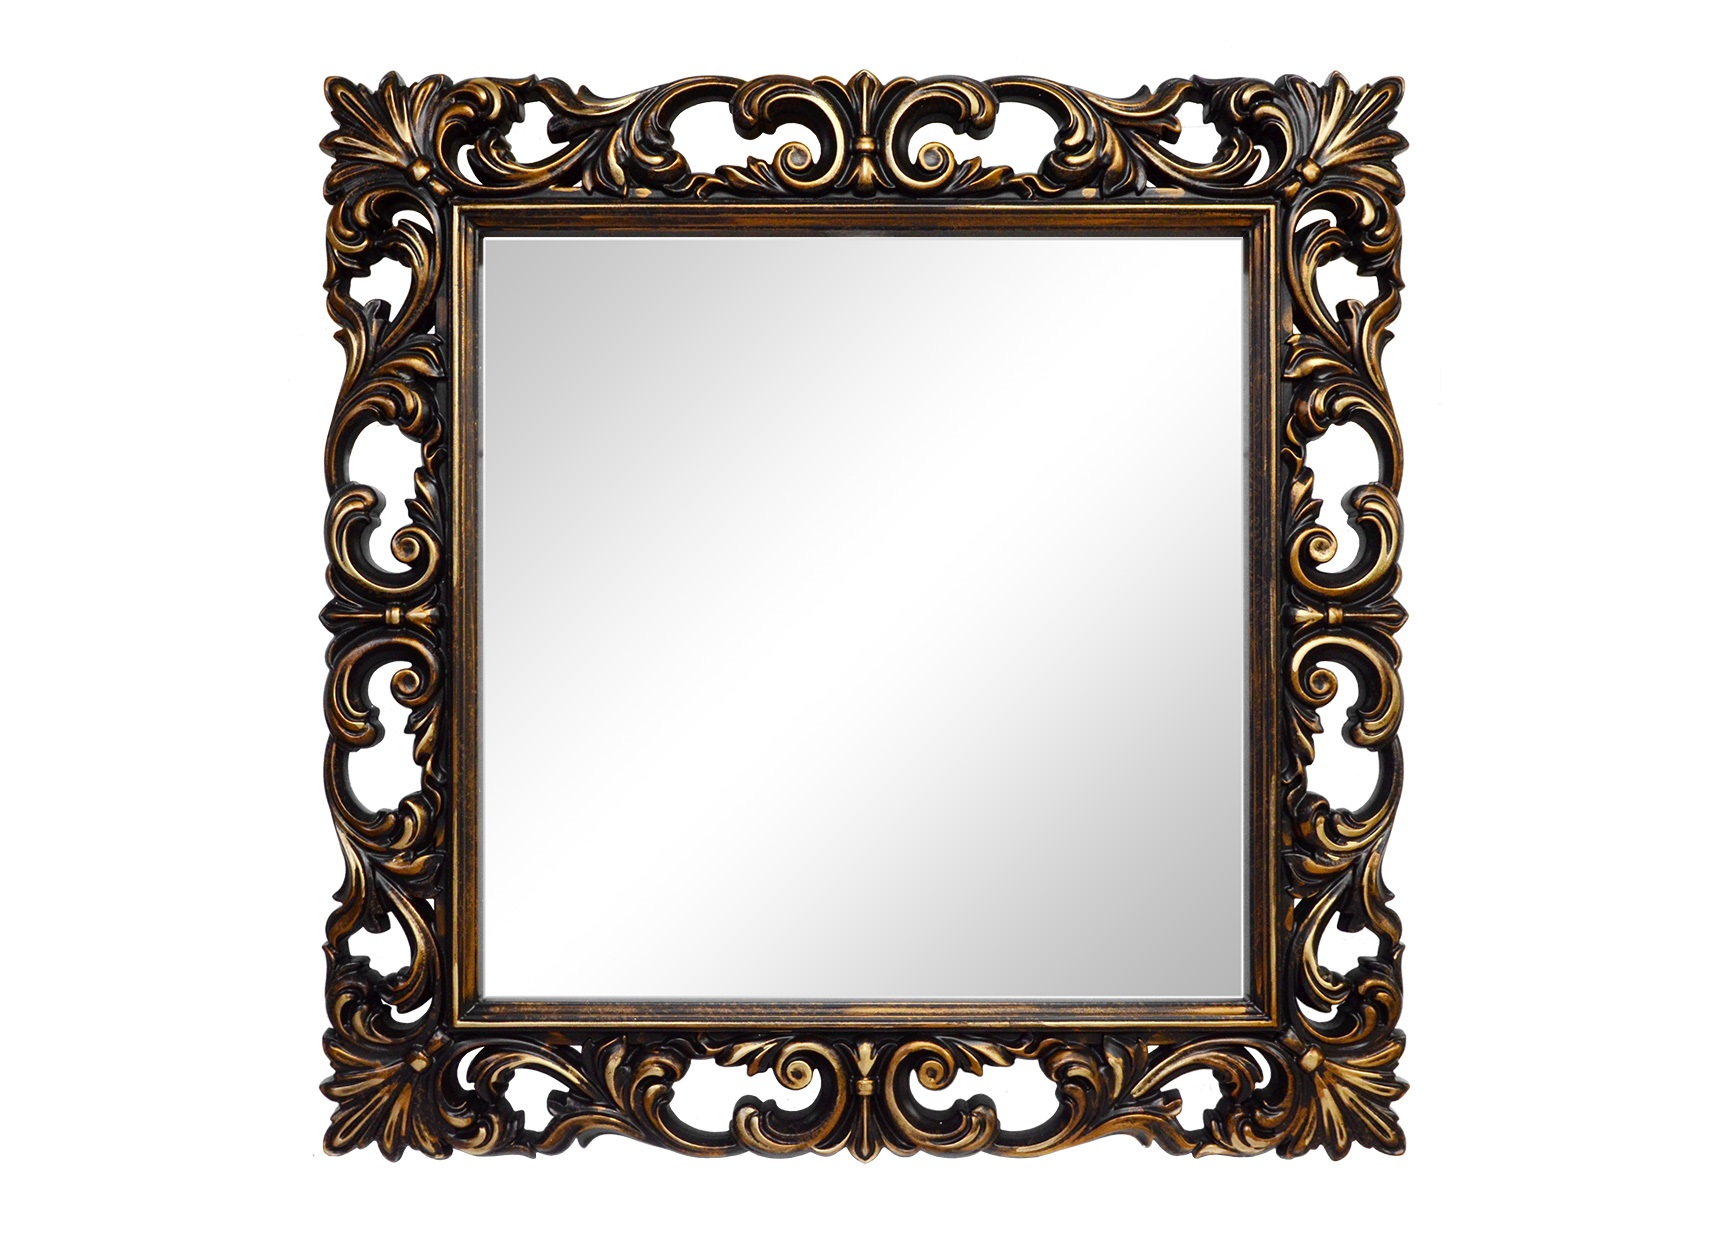 Зеркало НованоНастенные зеркала<br><br><br>Material: Стекло<br>Length см: None<br>Width см: 90<br>Depth см: 4<br>Height см: 90